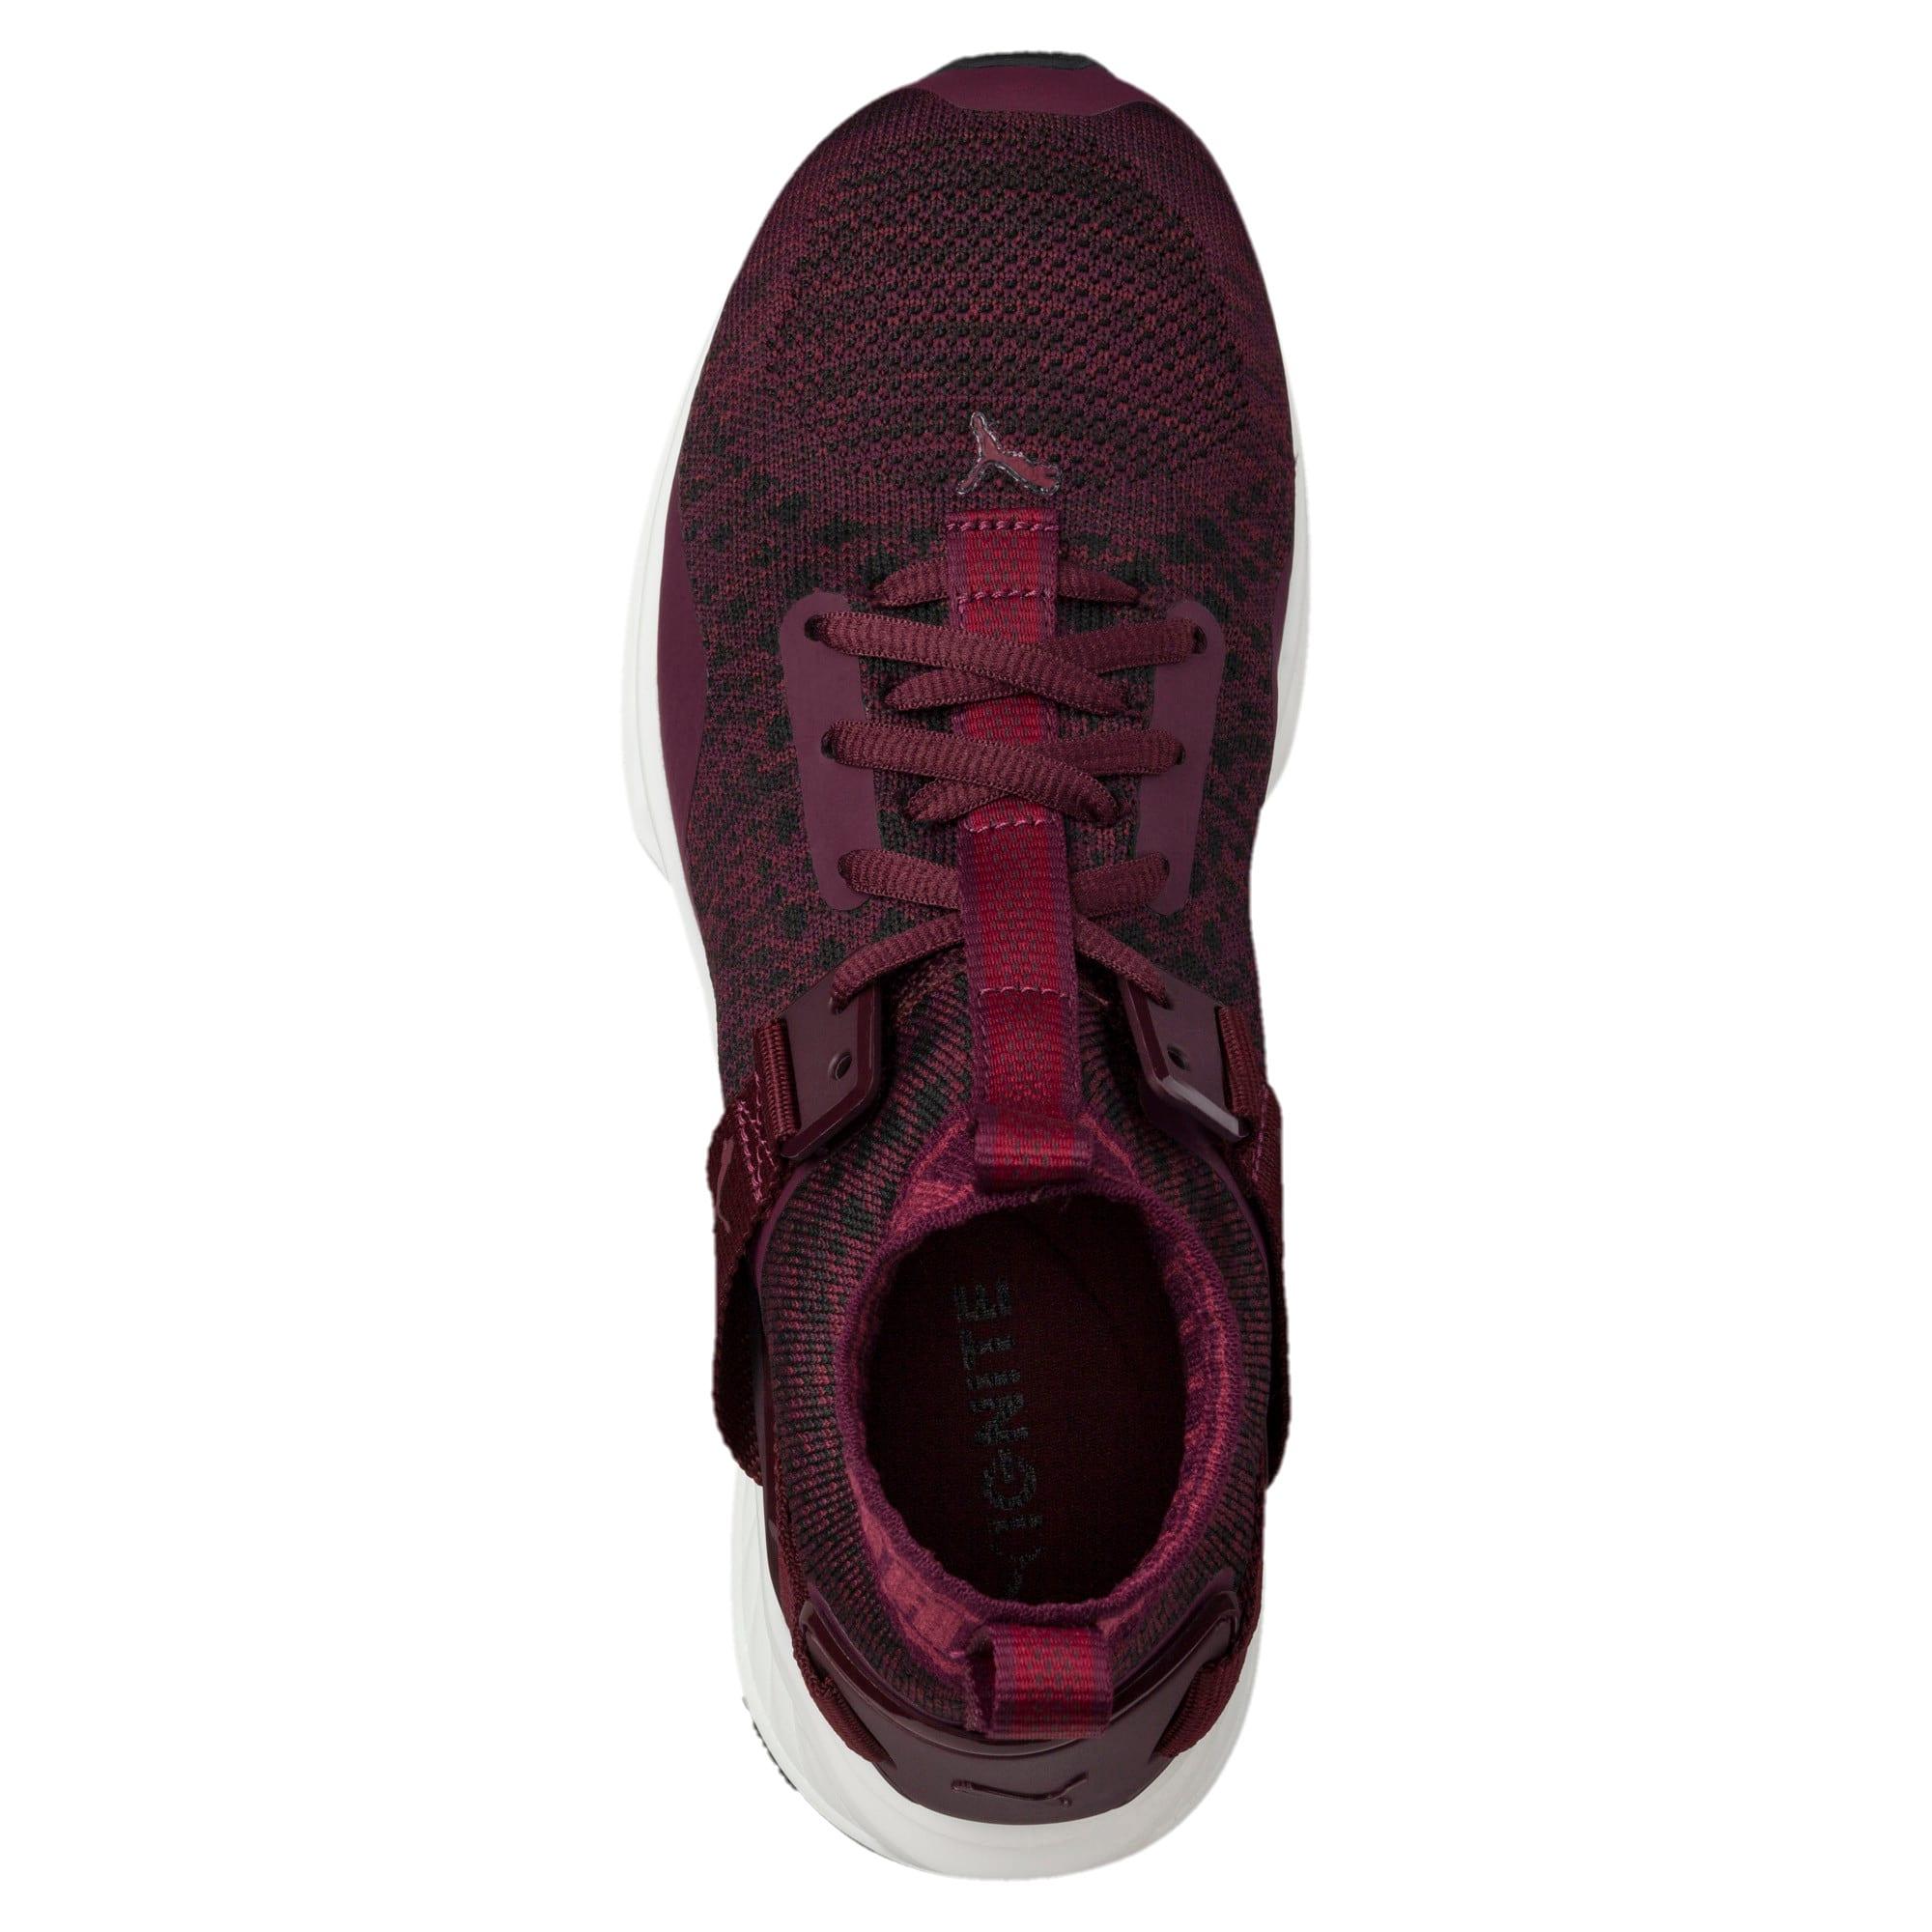 Thumbnail 5 of IGNITE evoKNIT Women's Training Shoes, Winetasting-CABARET-Black, medium